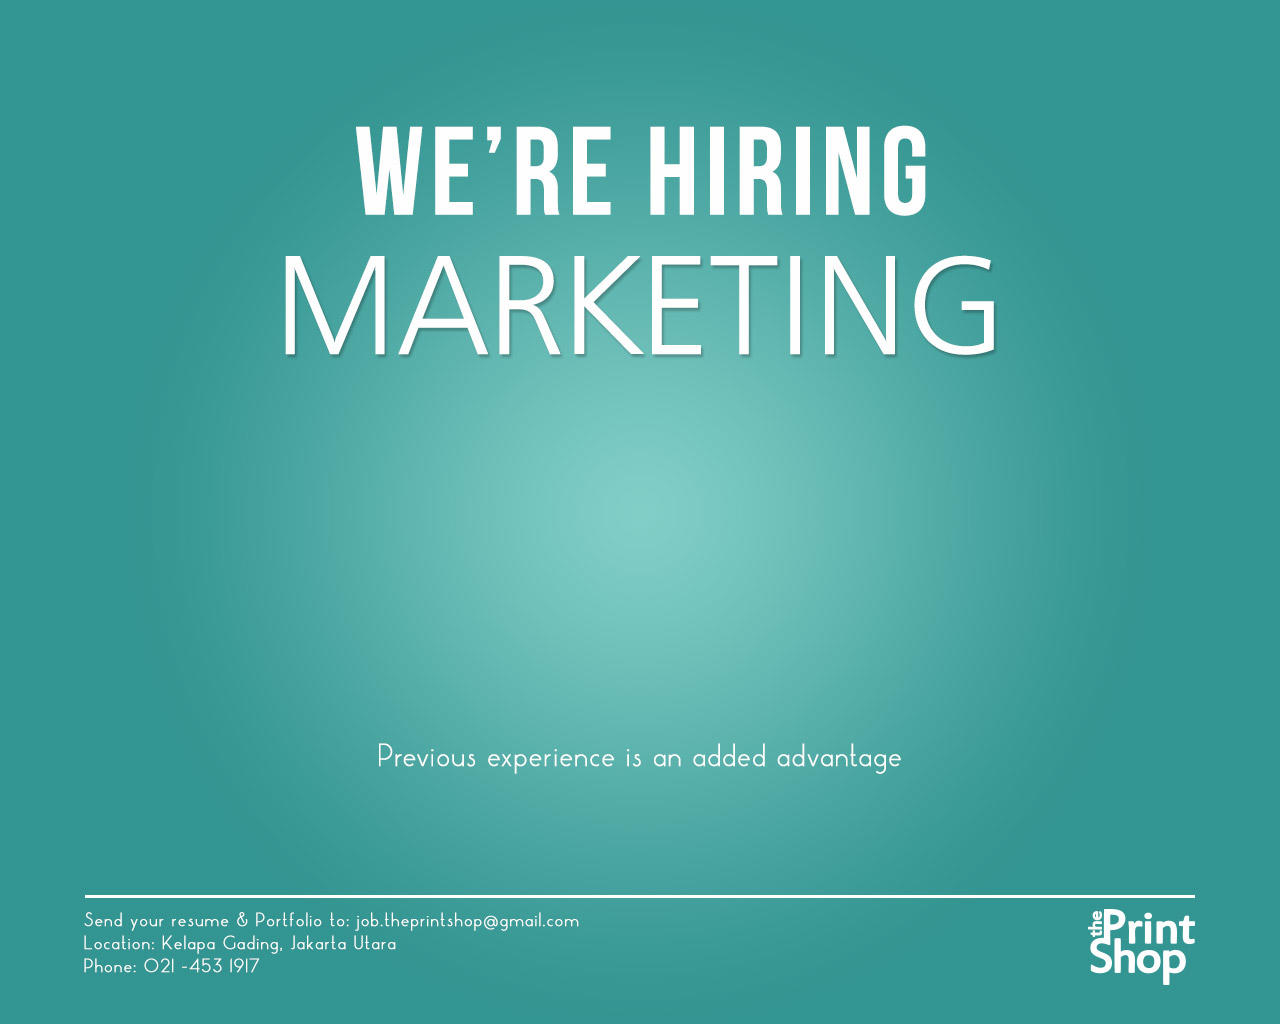 Hiring Marketing